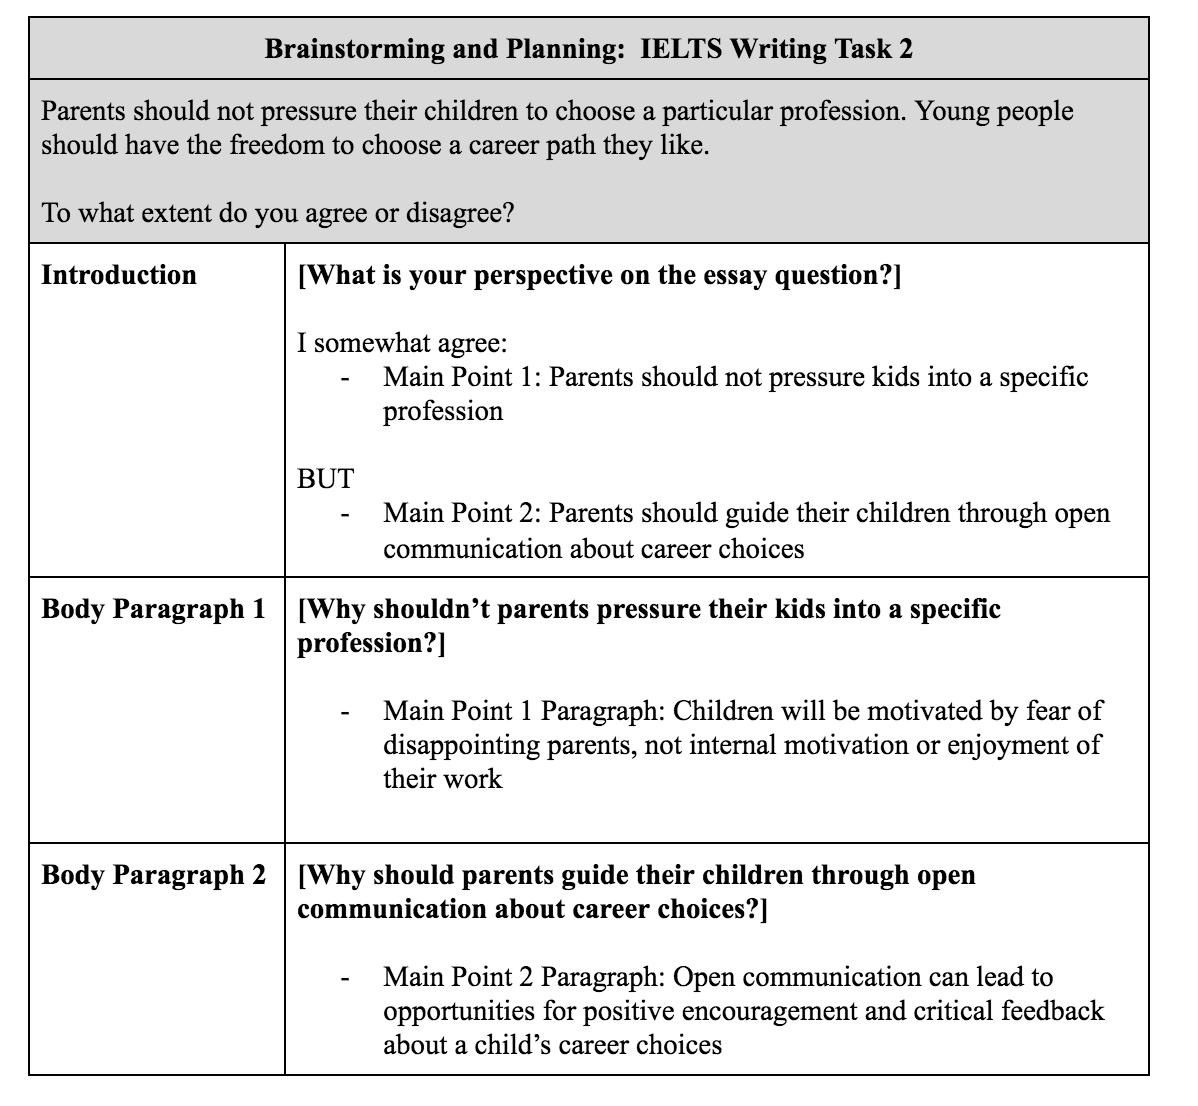 002 Screen Shot At Am Ielts Essay Writing General Training Unique Topics For Pdf Samples Full